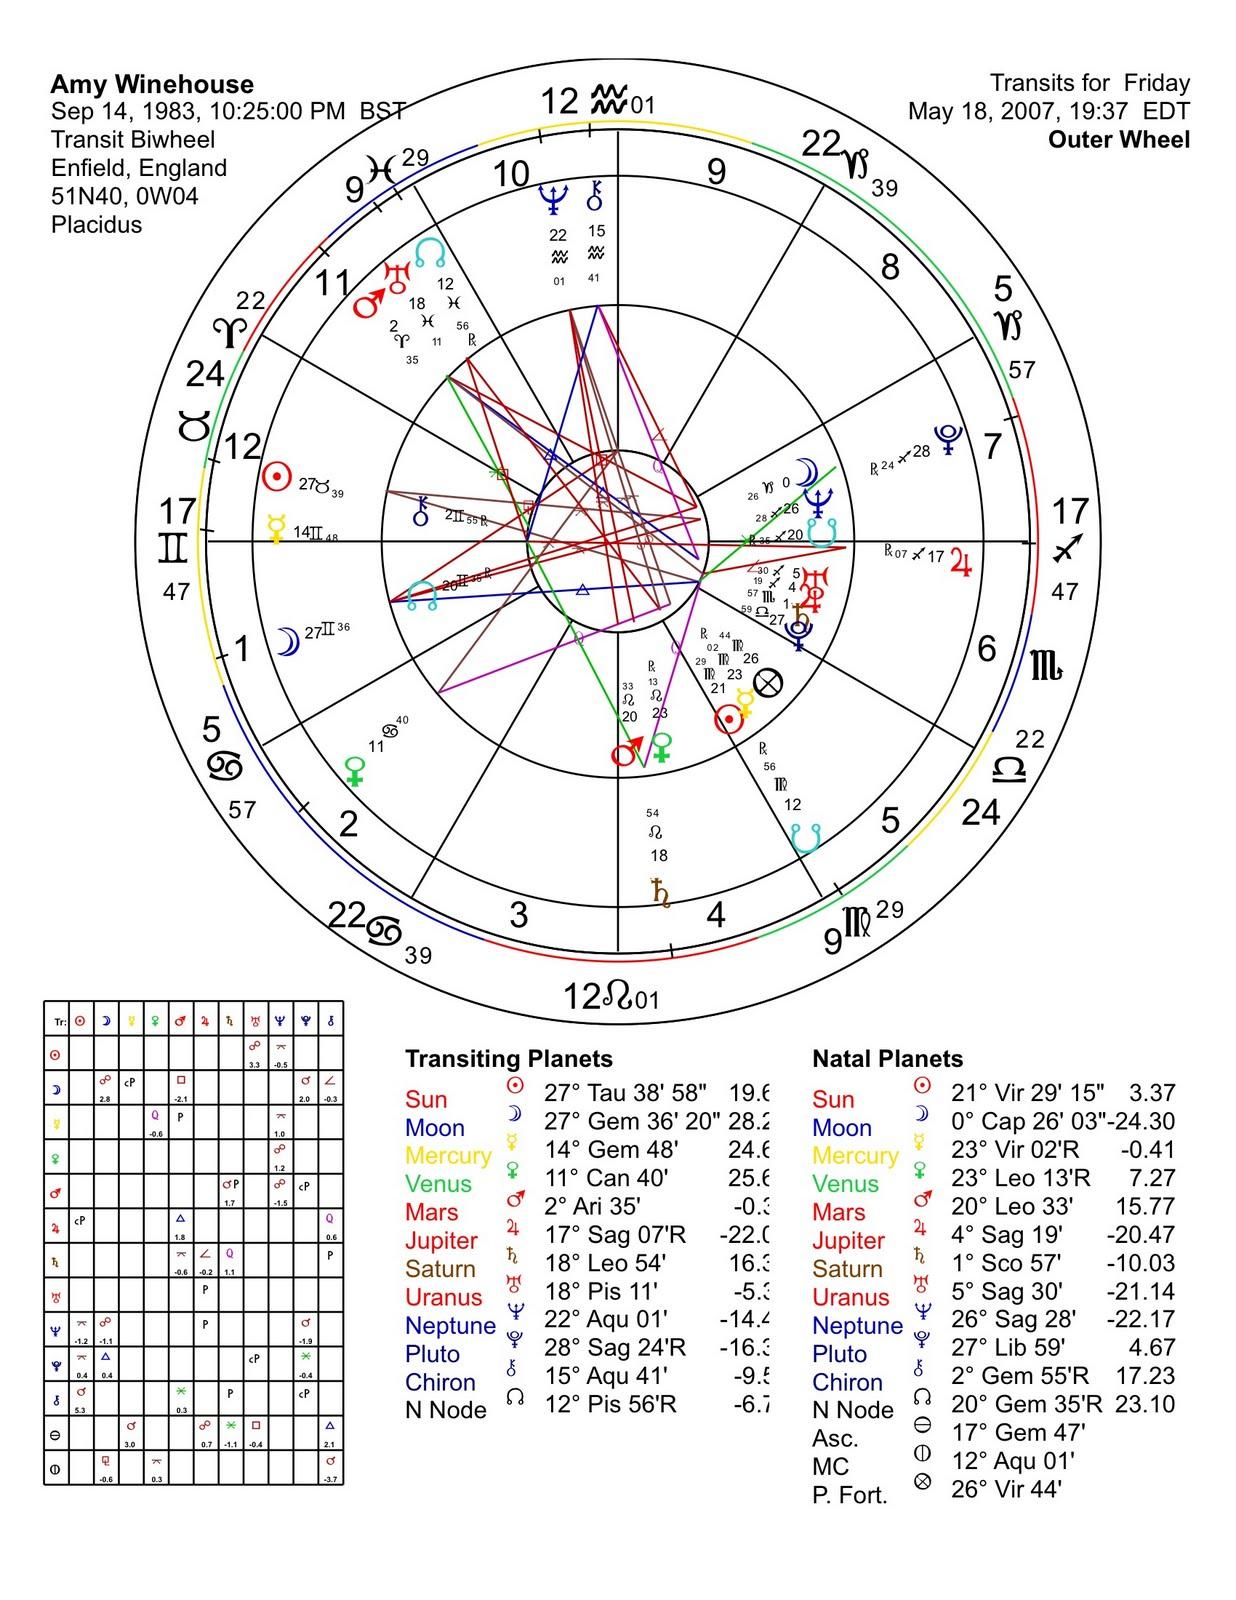 Amaizing Journeys Astrology Amy Winehouse Shooting Star